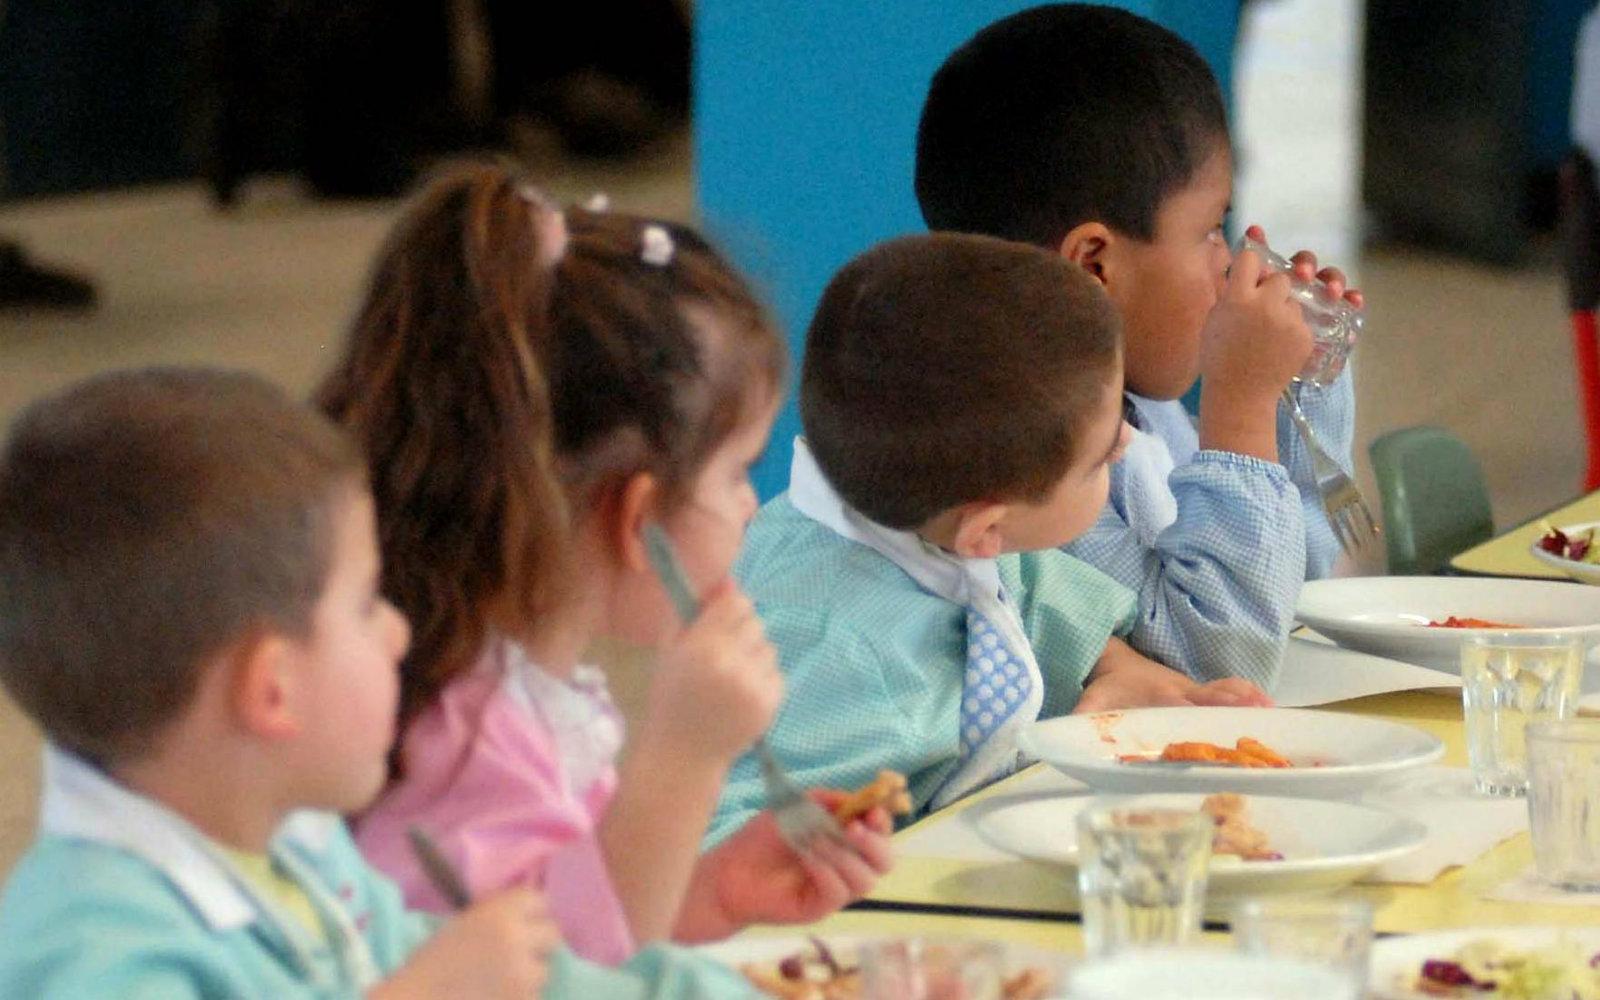 cosa mangiano i bambini alla scuola materna